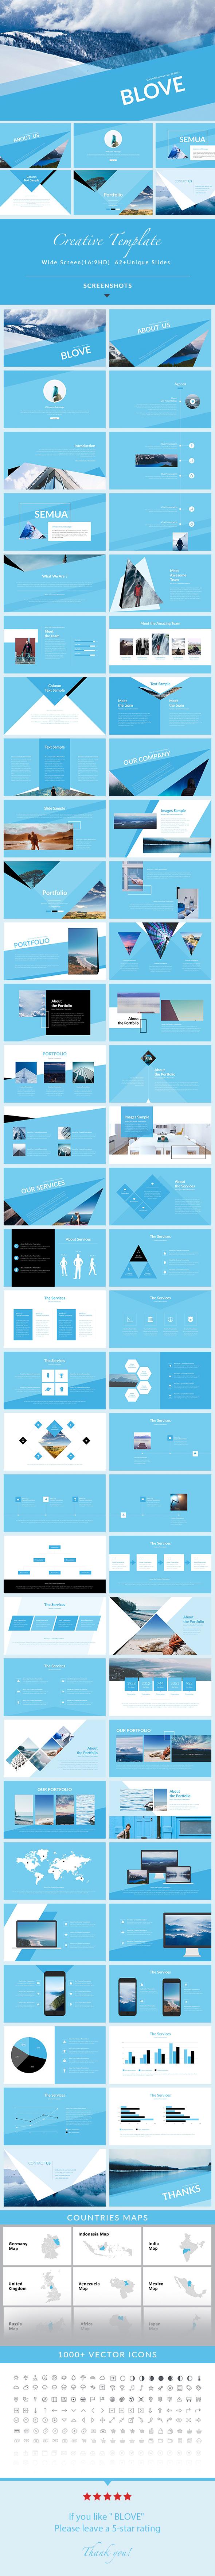 Blove - Keynote Presentation Template - Creative Keynote Templates